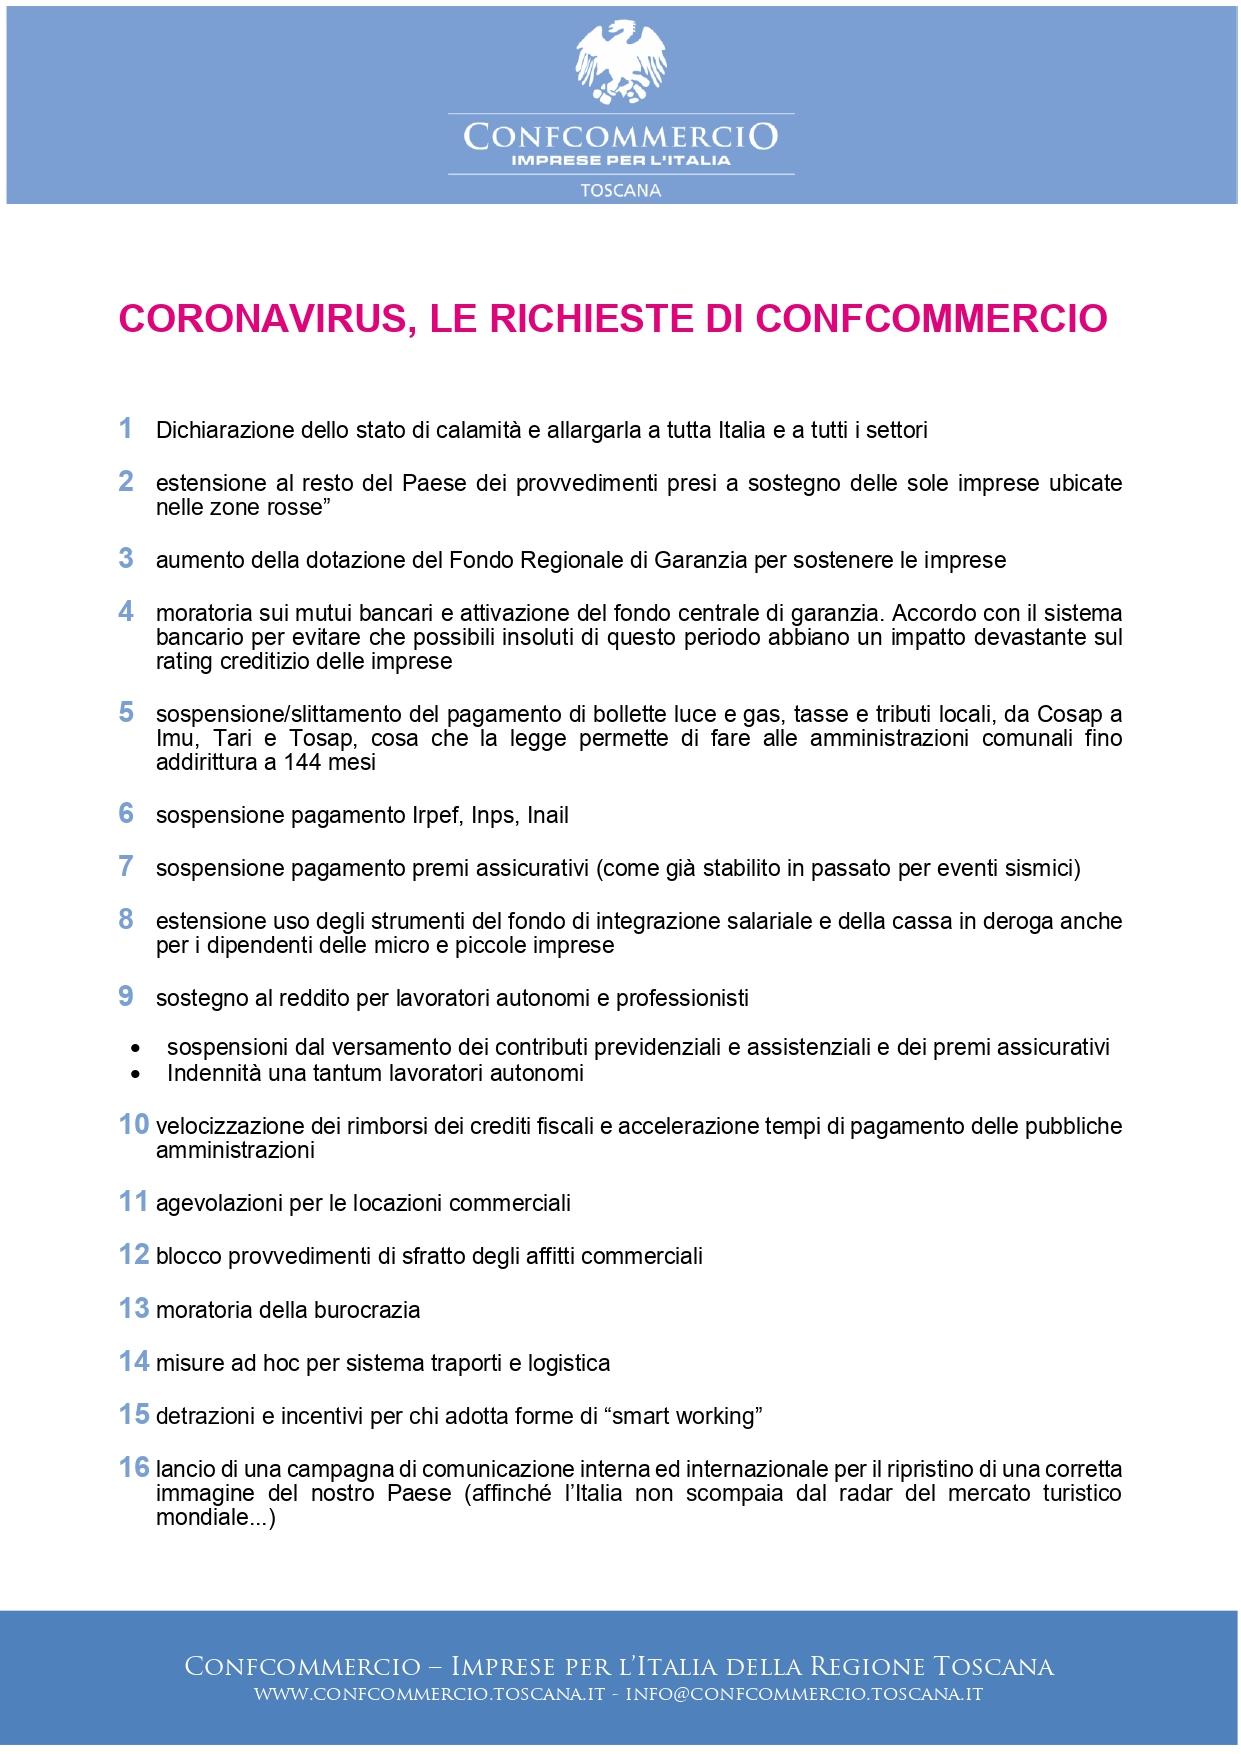 Coronavirus, da Confcommercio la locandina da affiggere ...